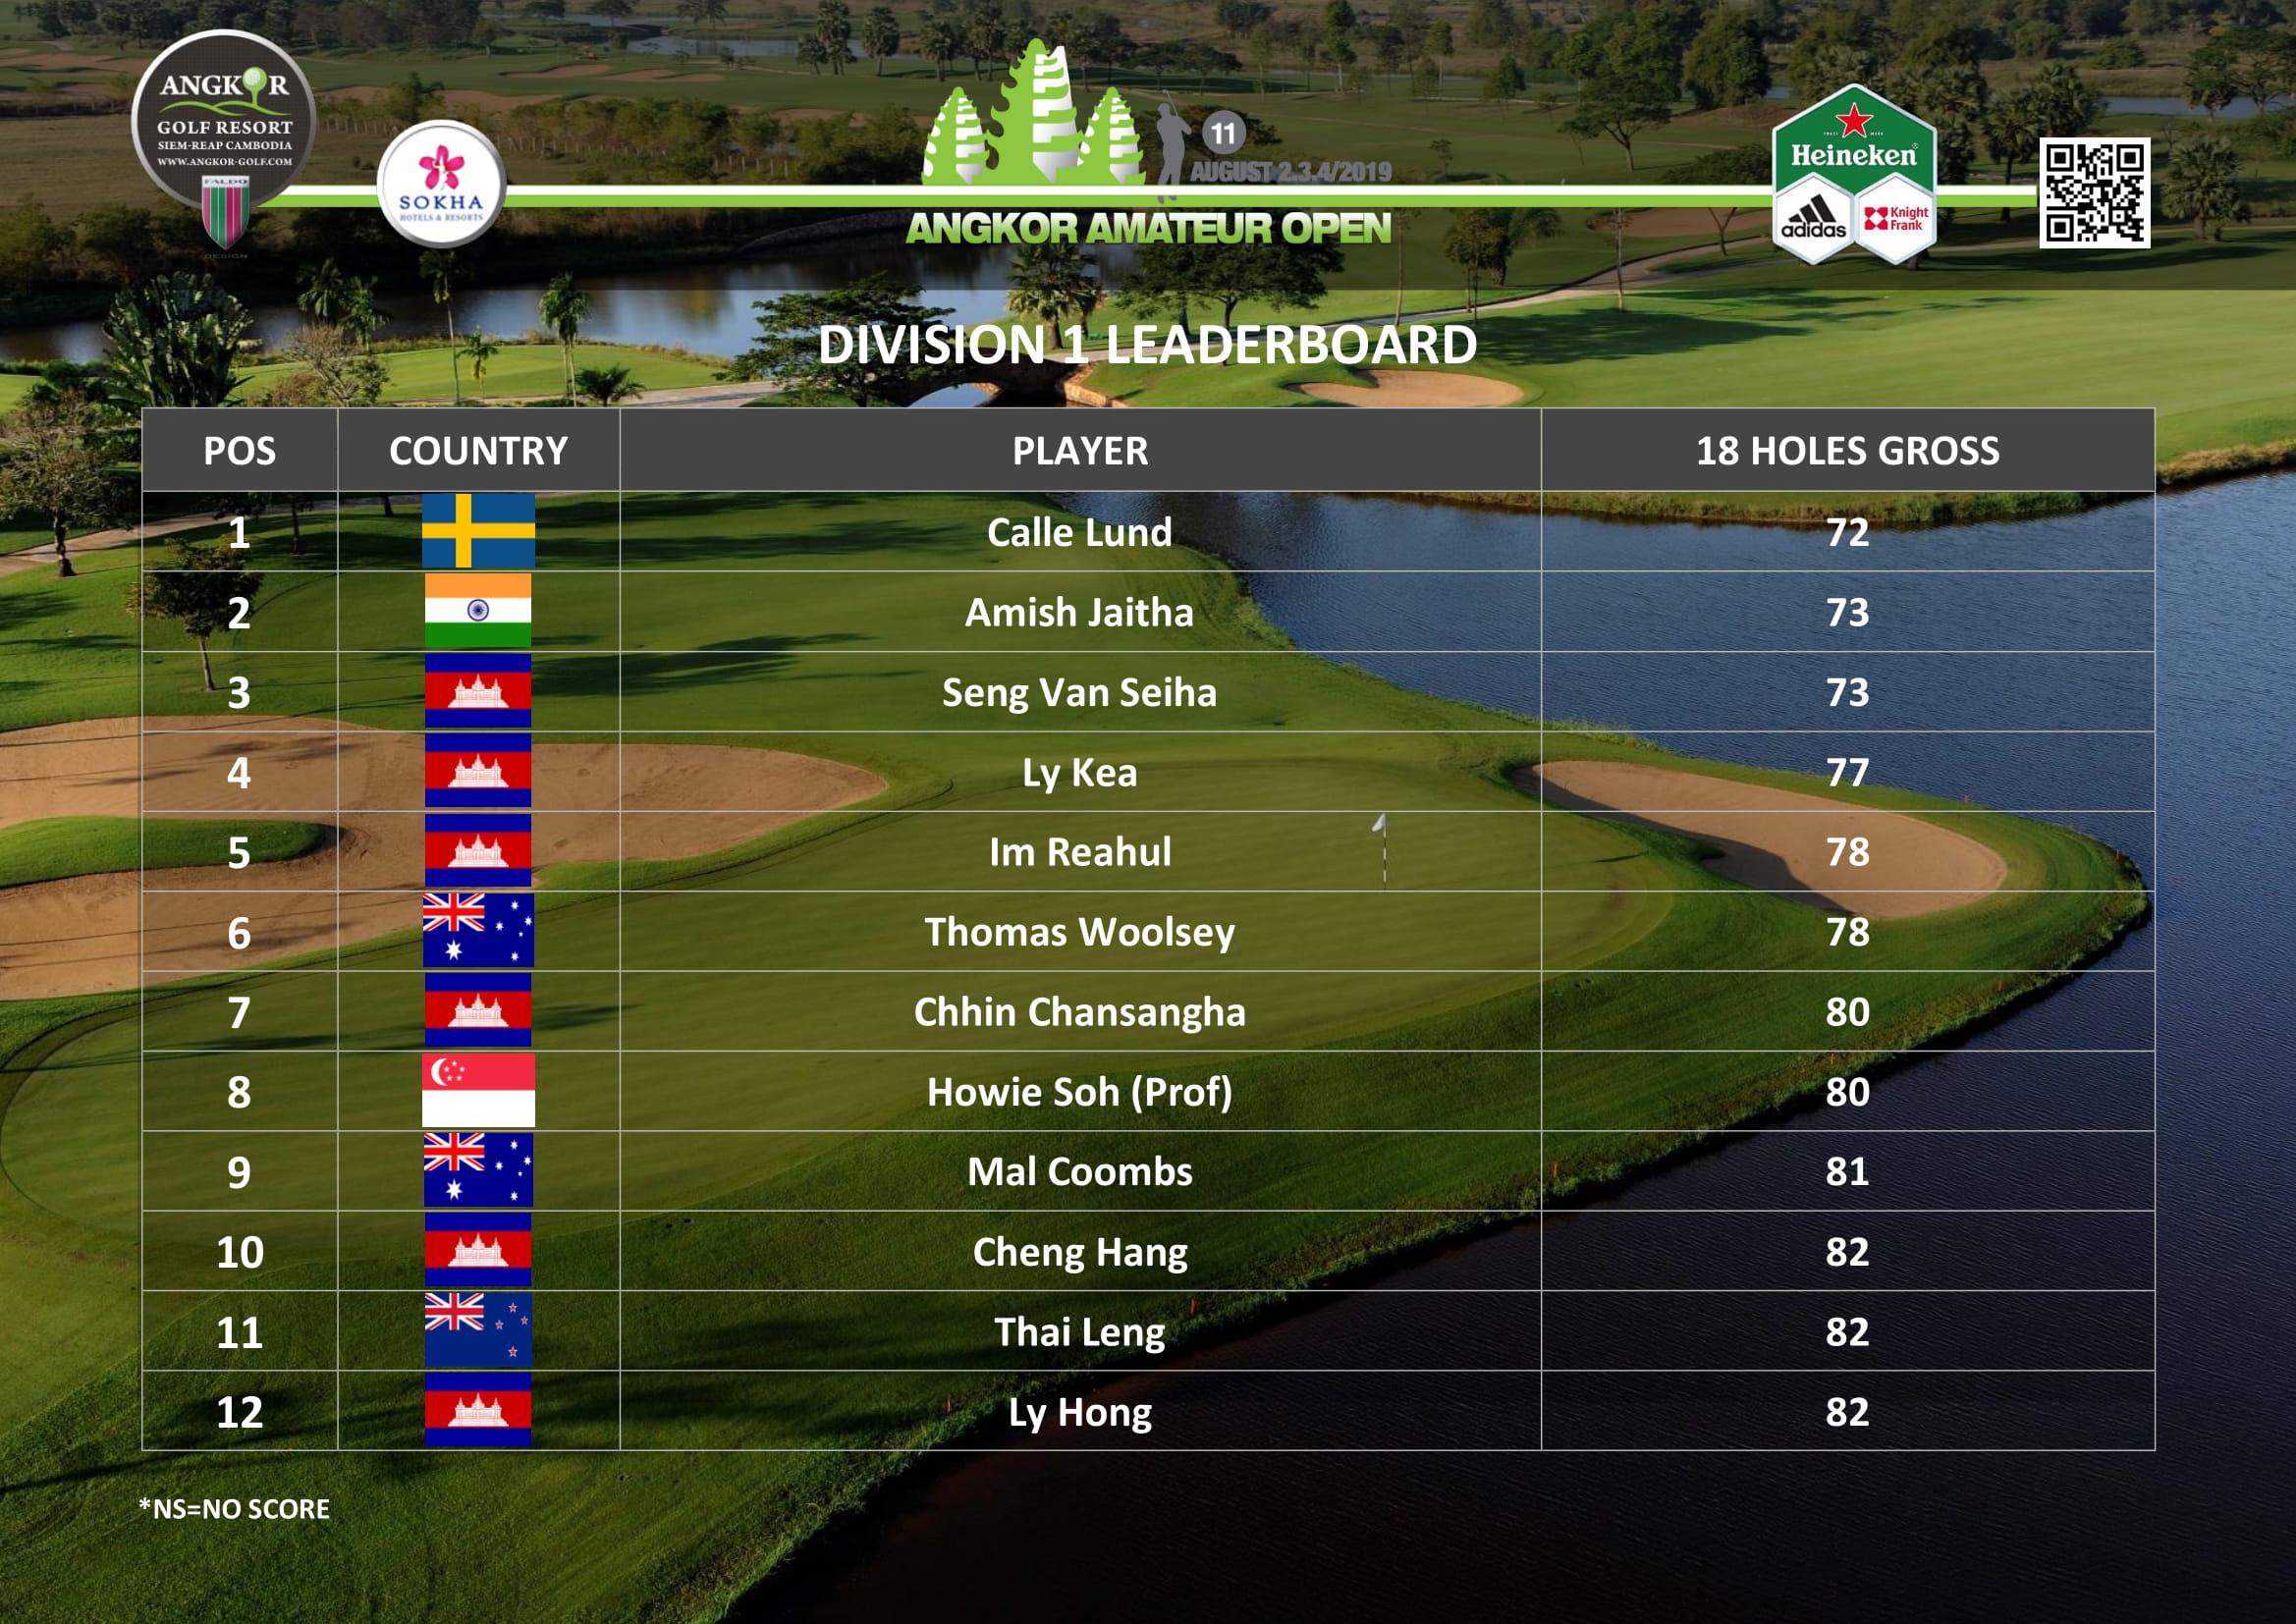 Leaderboard - Division 1 Gross.jpg